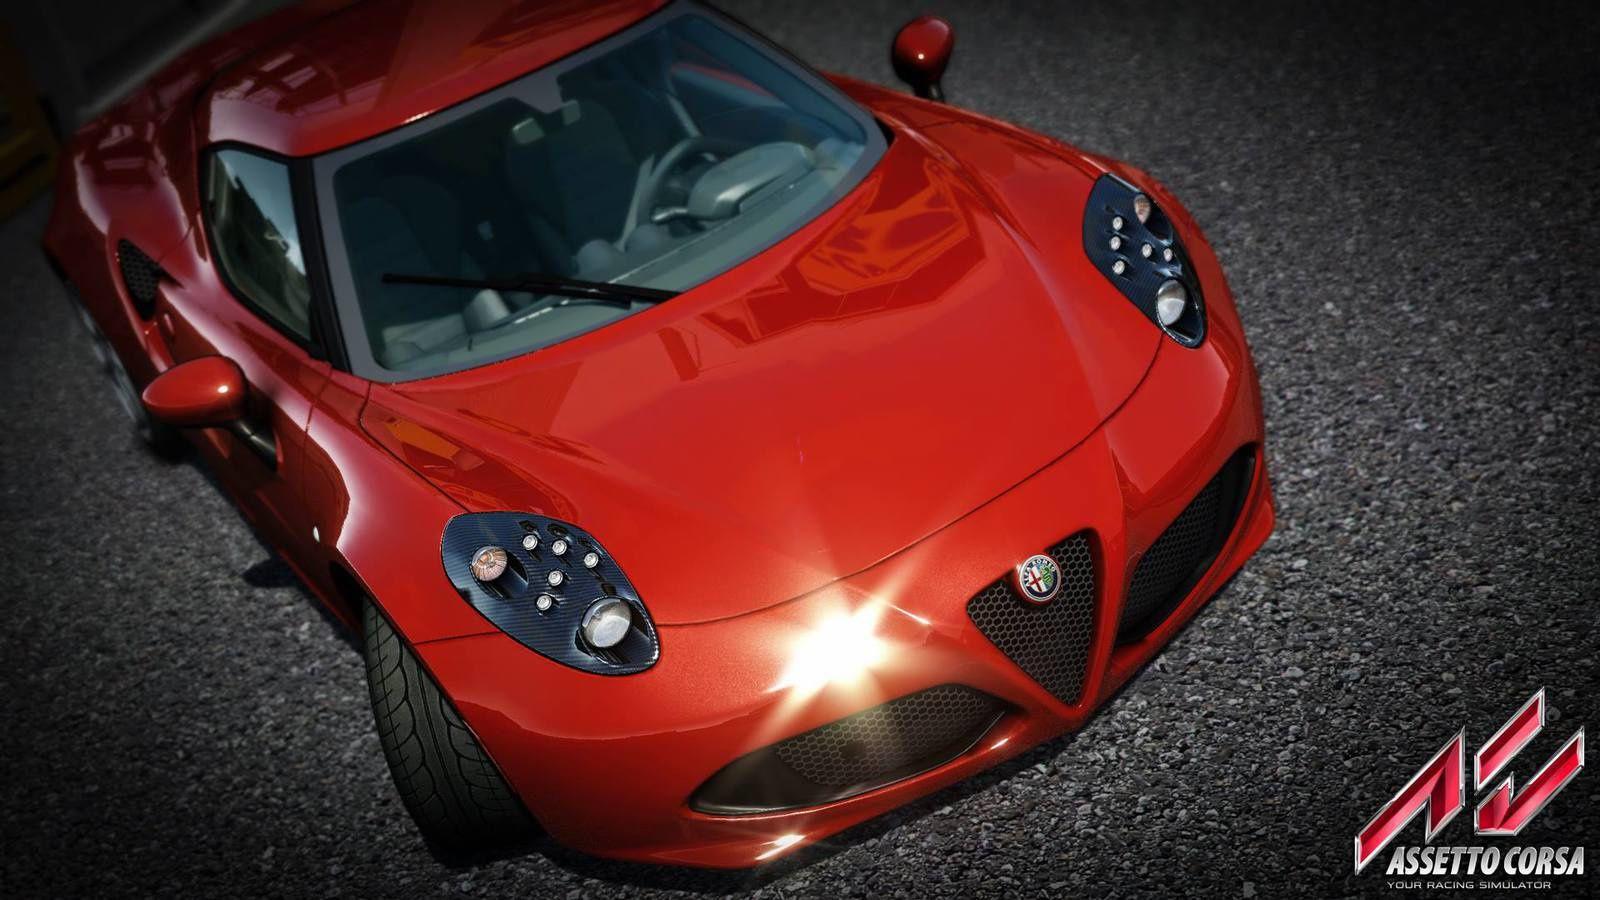 Assetto Corsa - Dream Pack - Alfa Romeo 4C